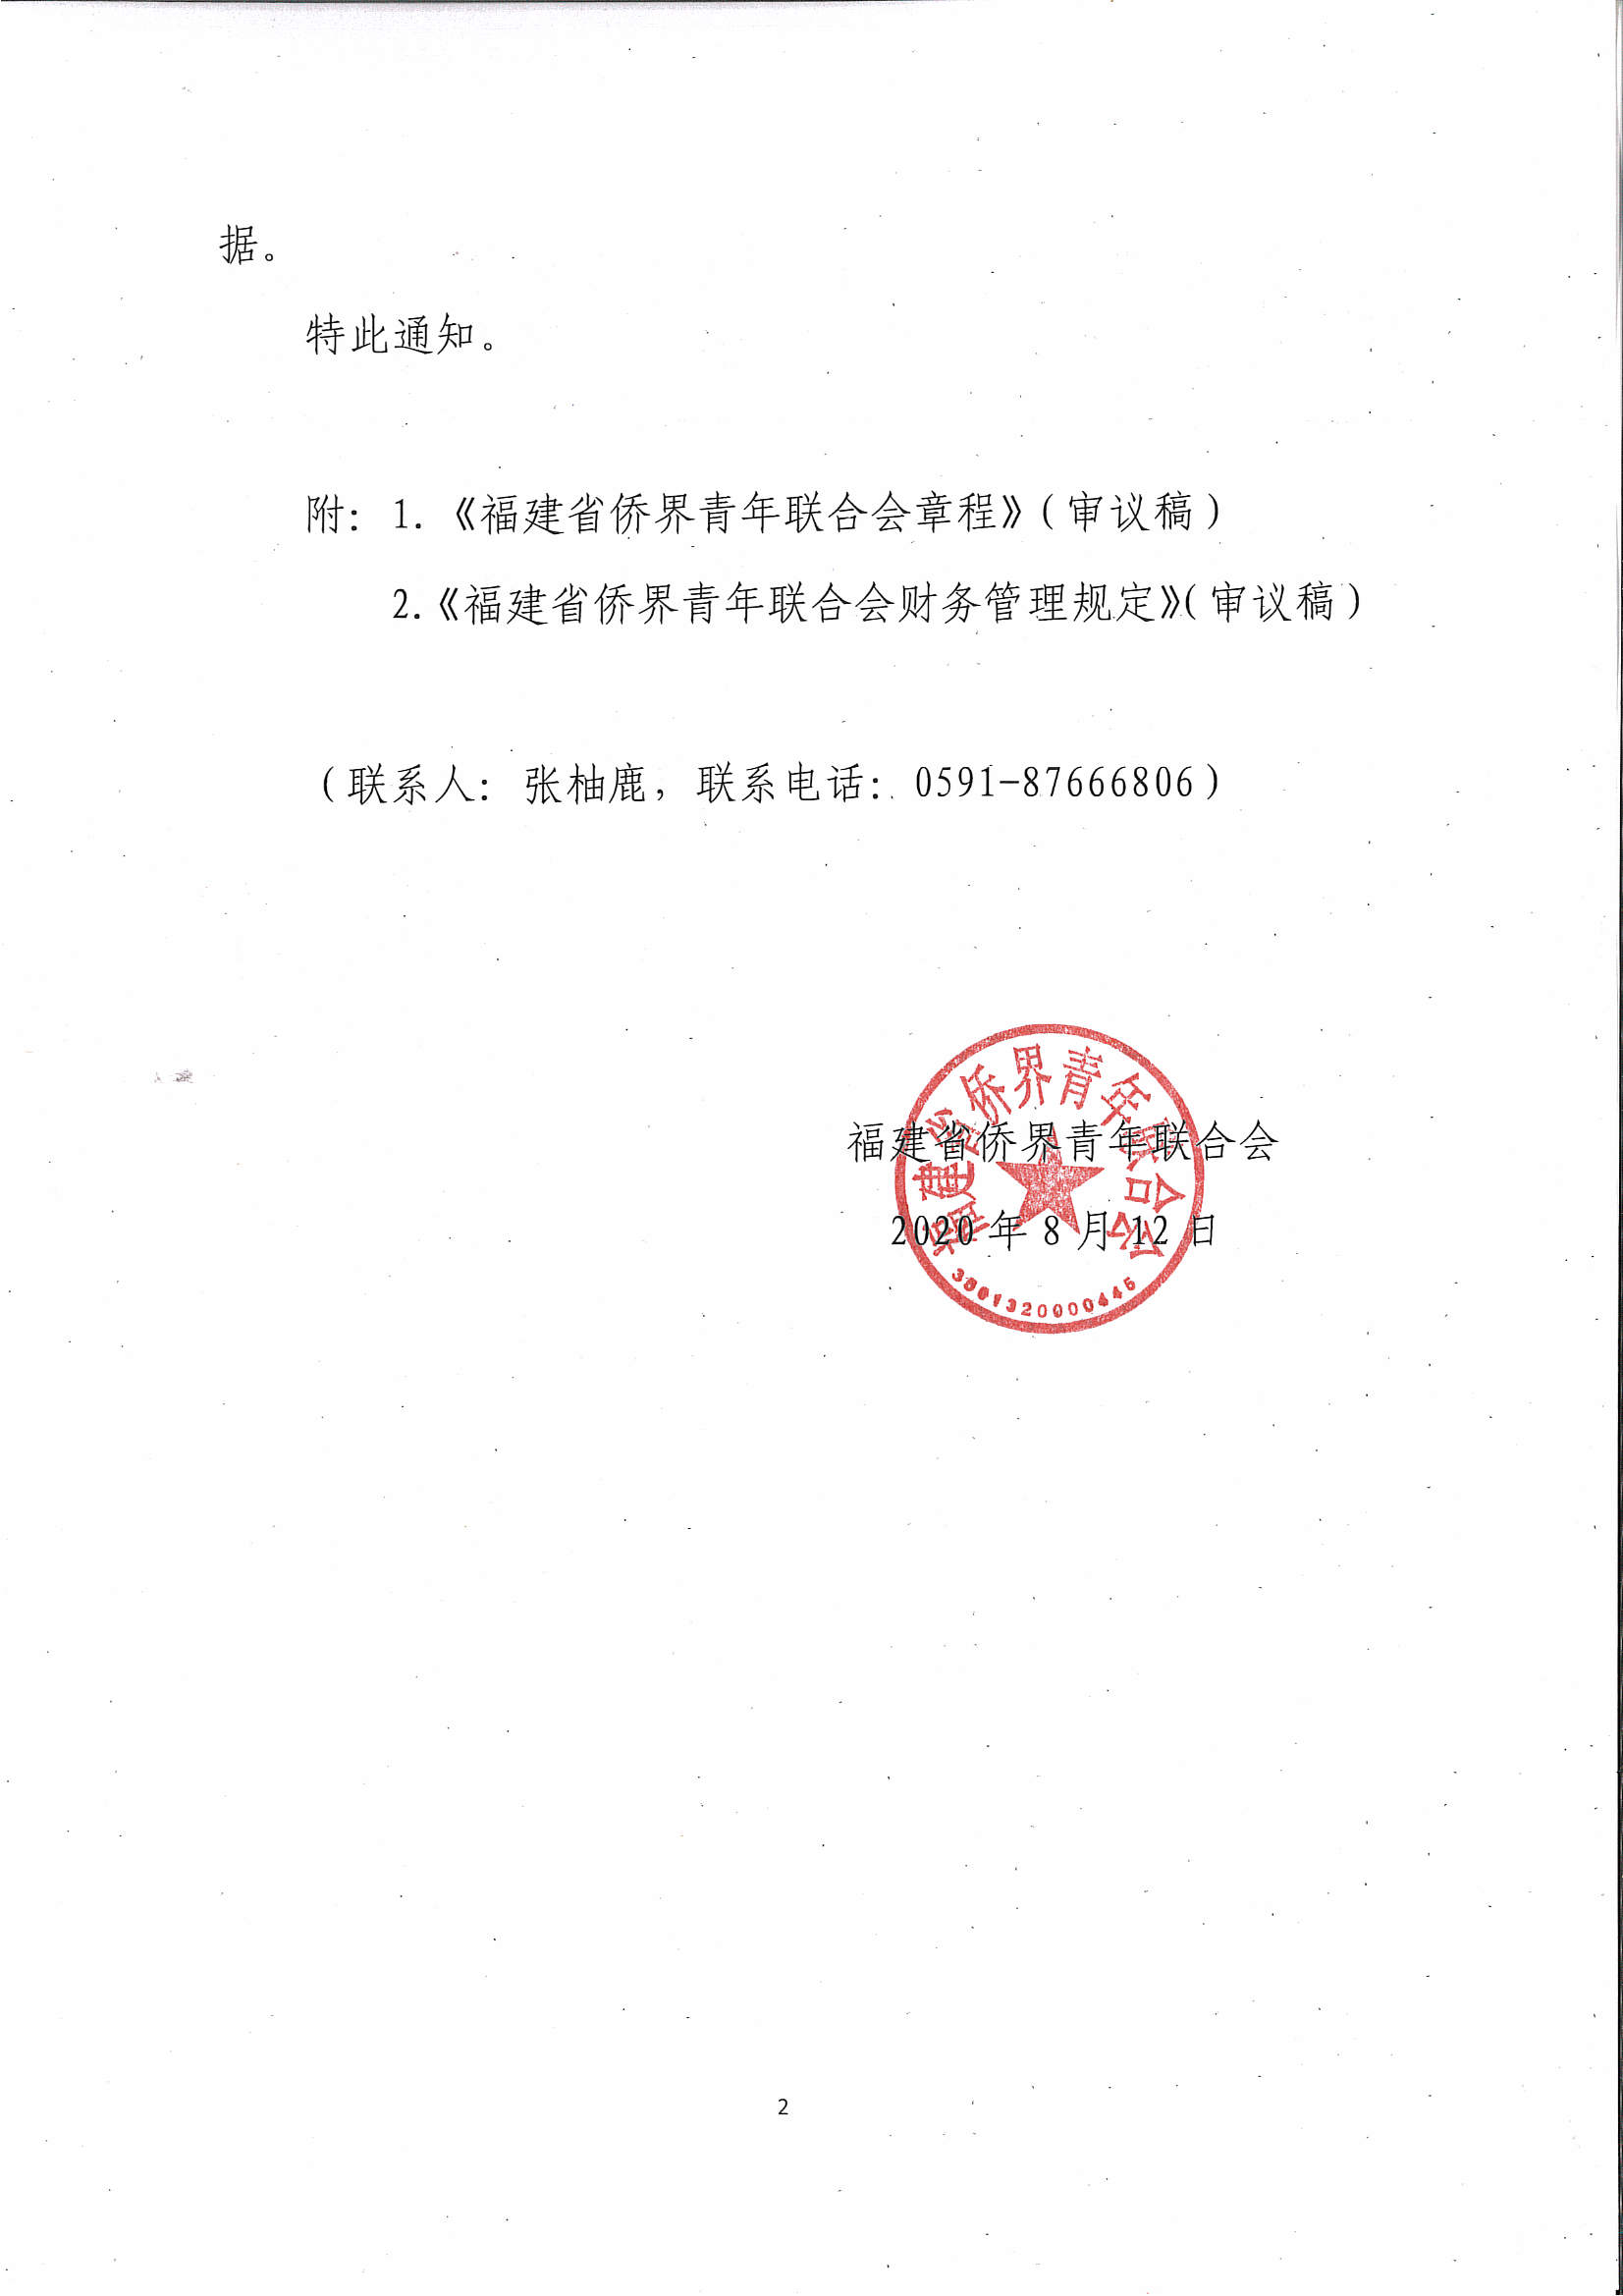 MX-M2608U_20200812_182131_页面_02.jpg